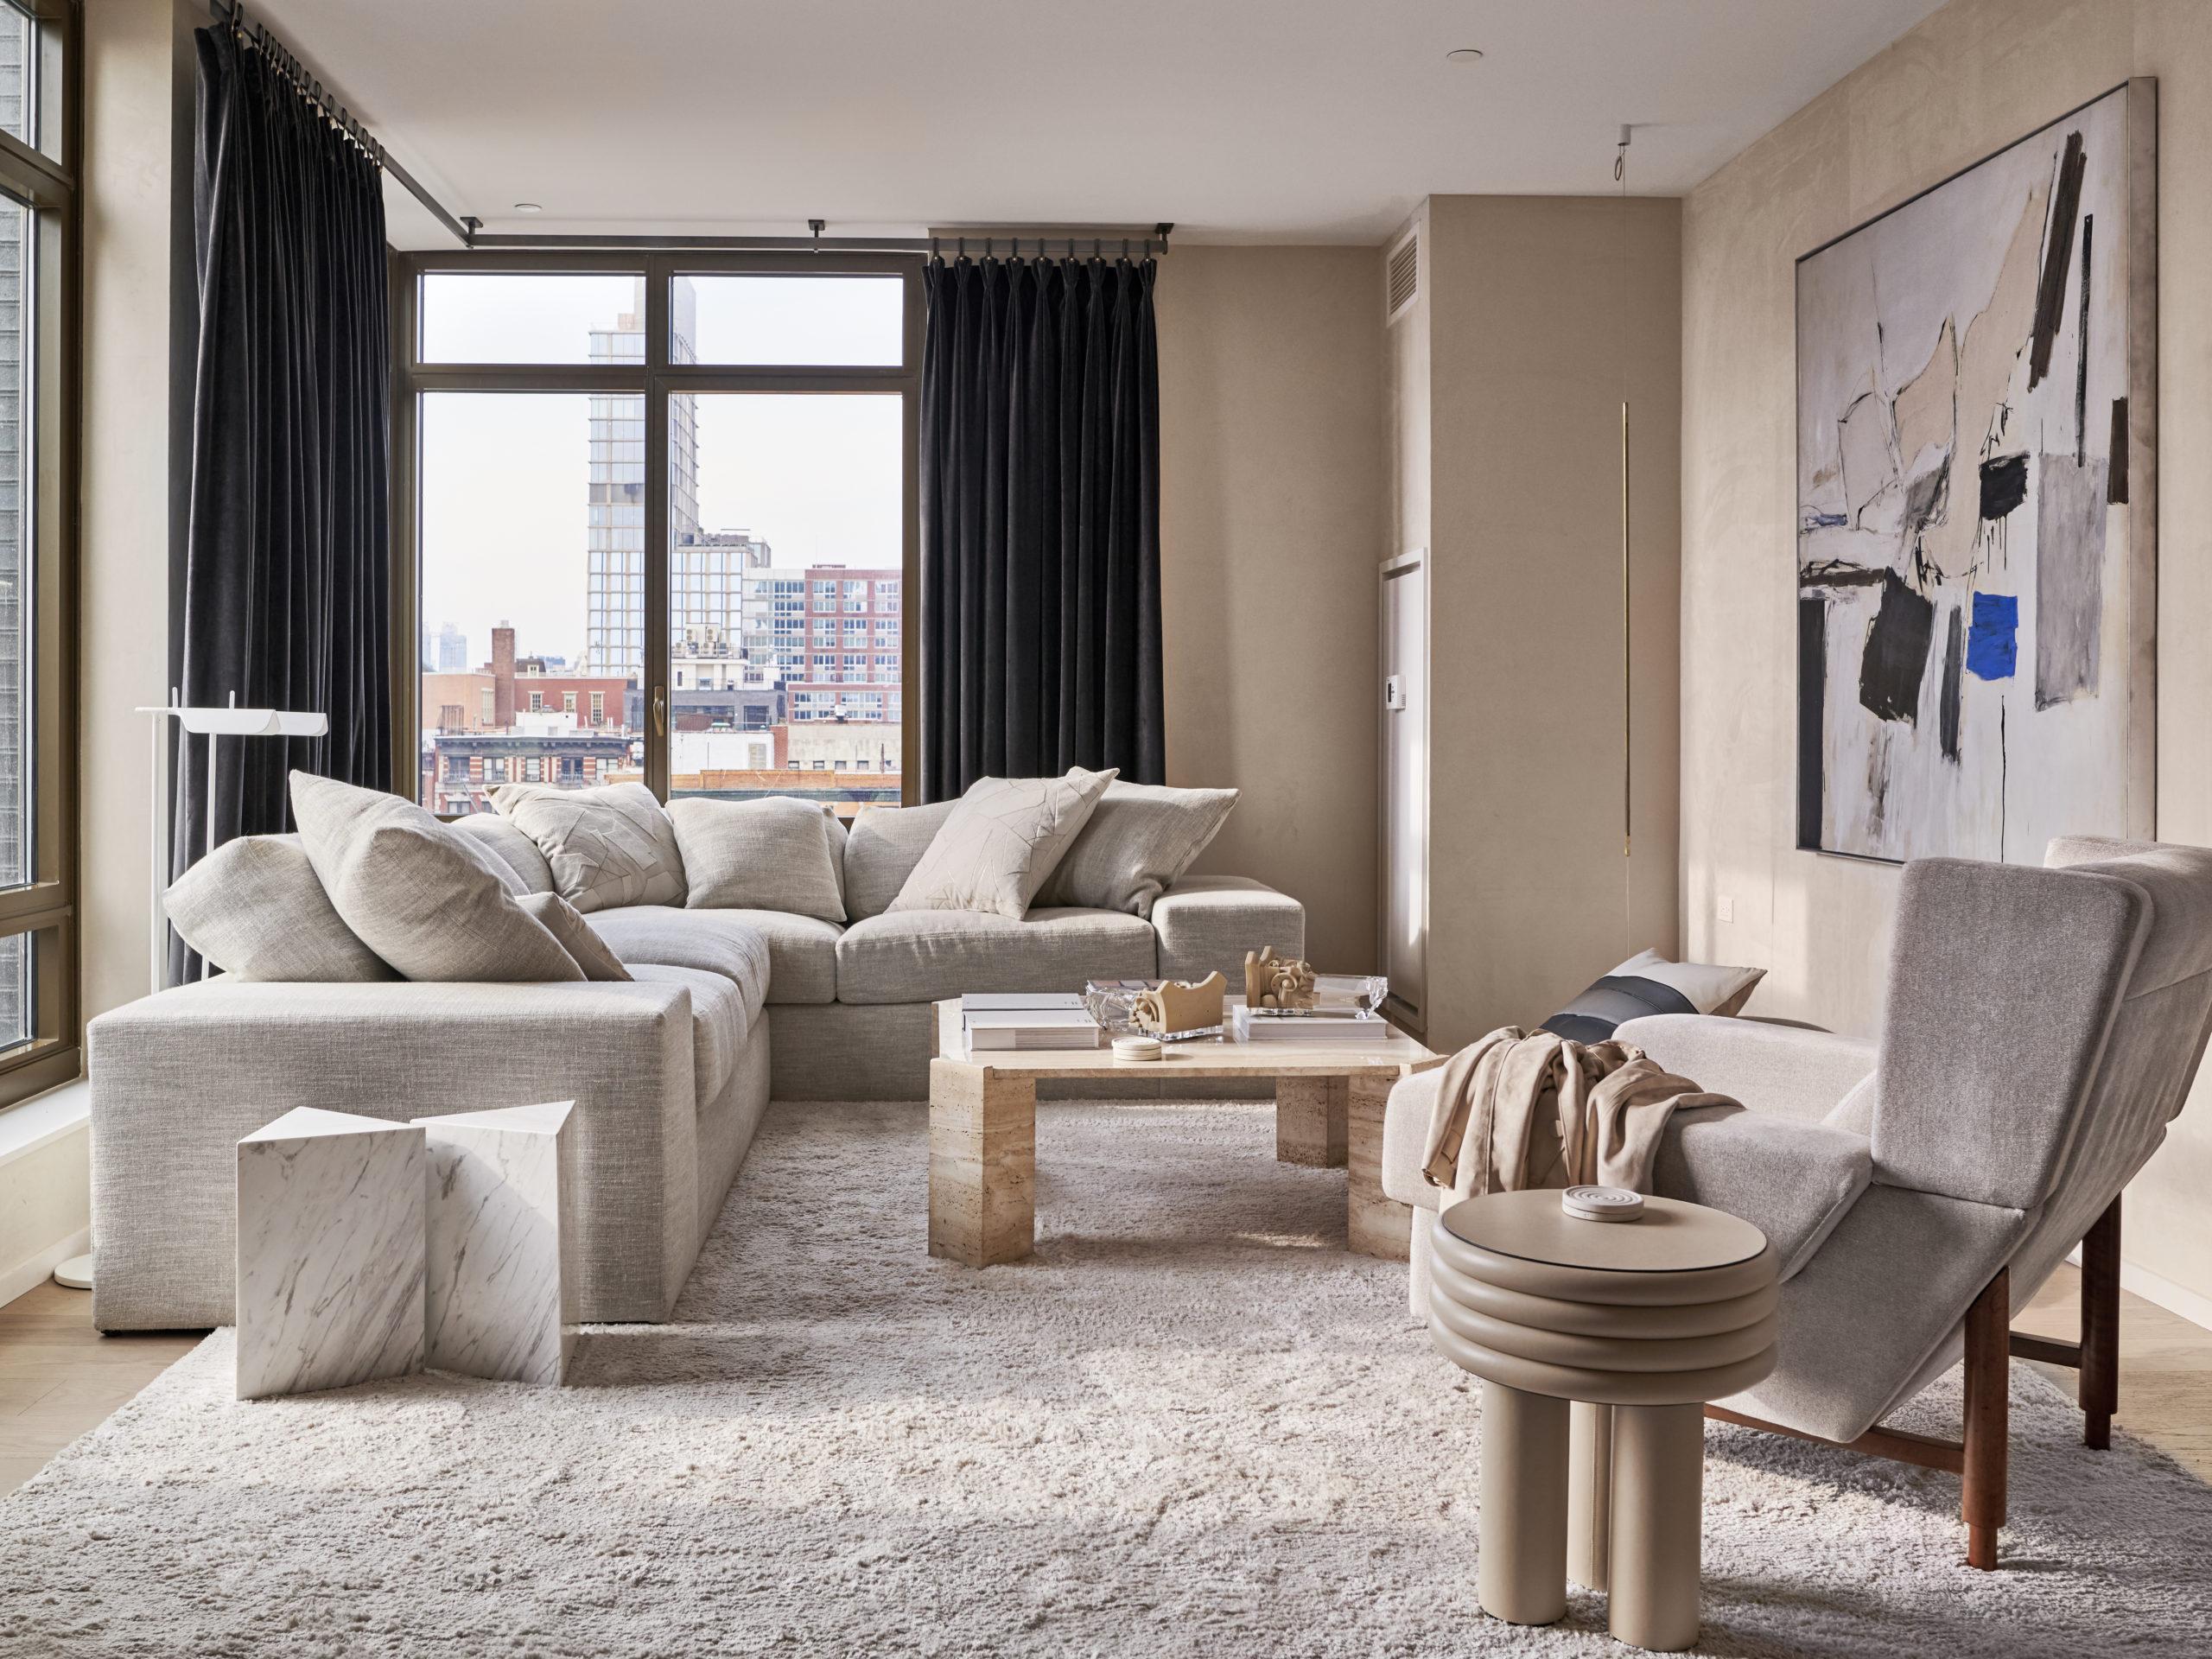 A Manhattan apartment designed by Timothy Godbold.